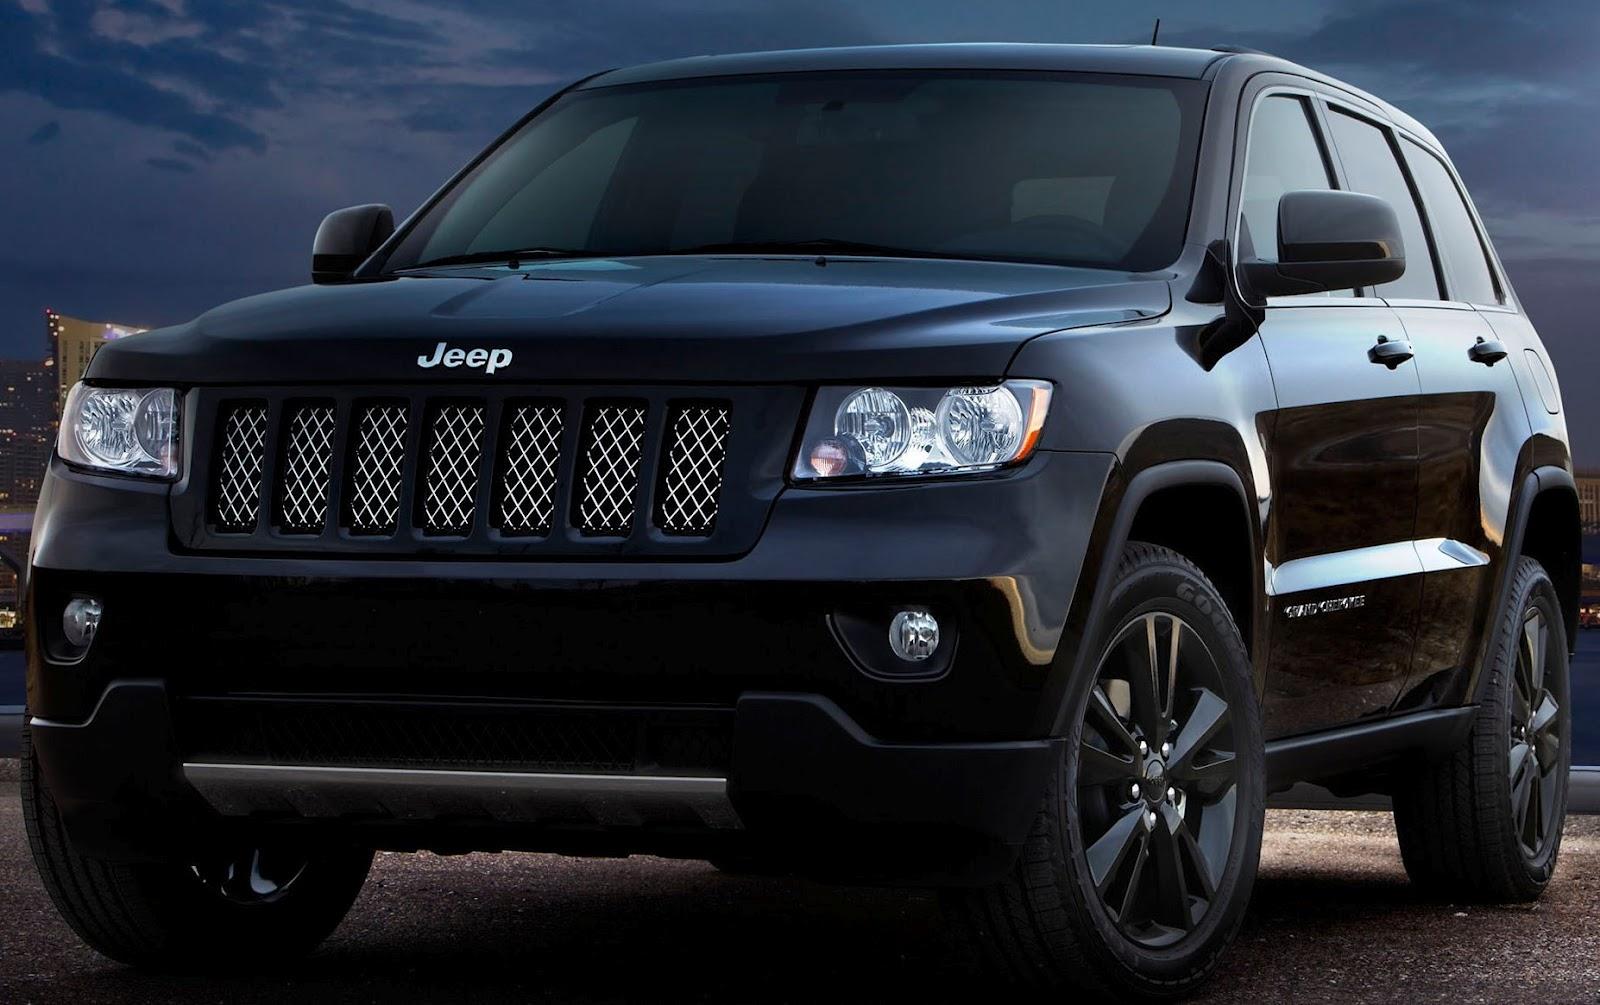 sport car garage 2012 jeep grand cherokee concep. Black Bedroom Furniture Sets. Home Design Ideas